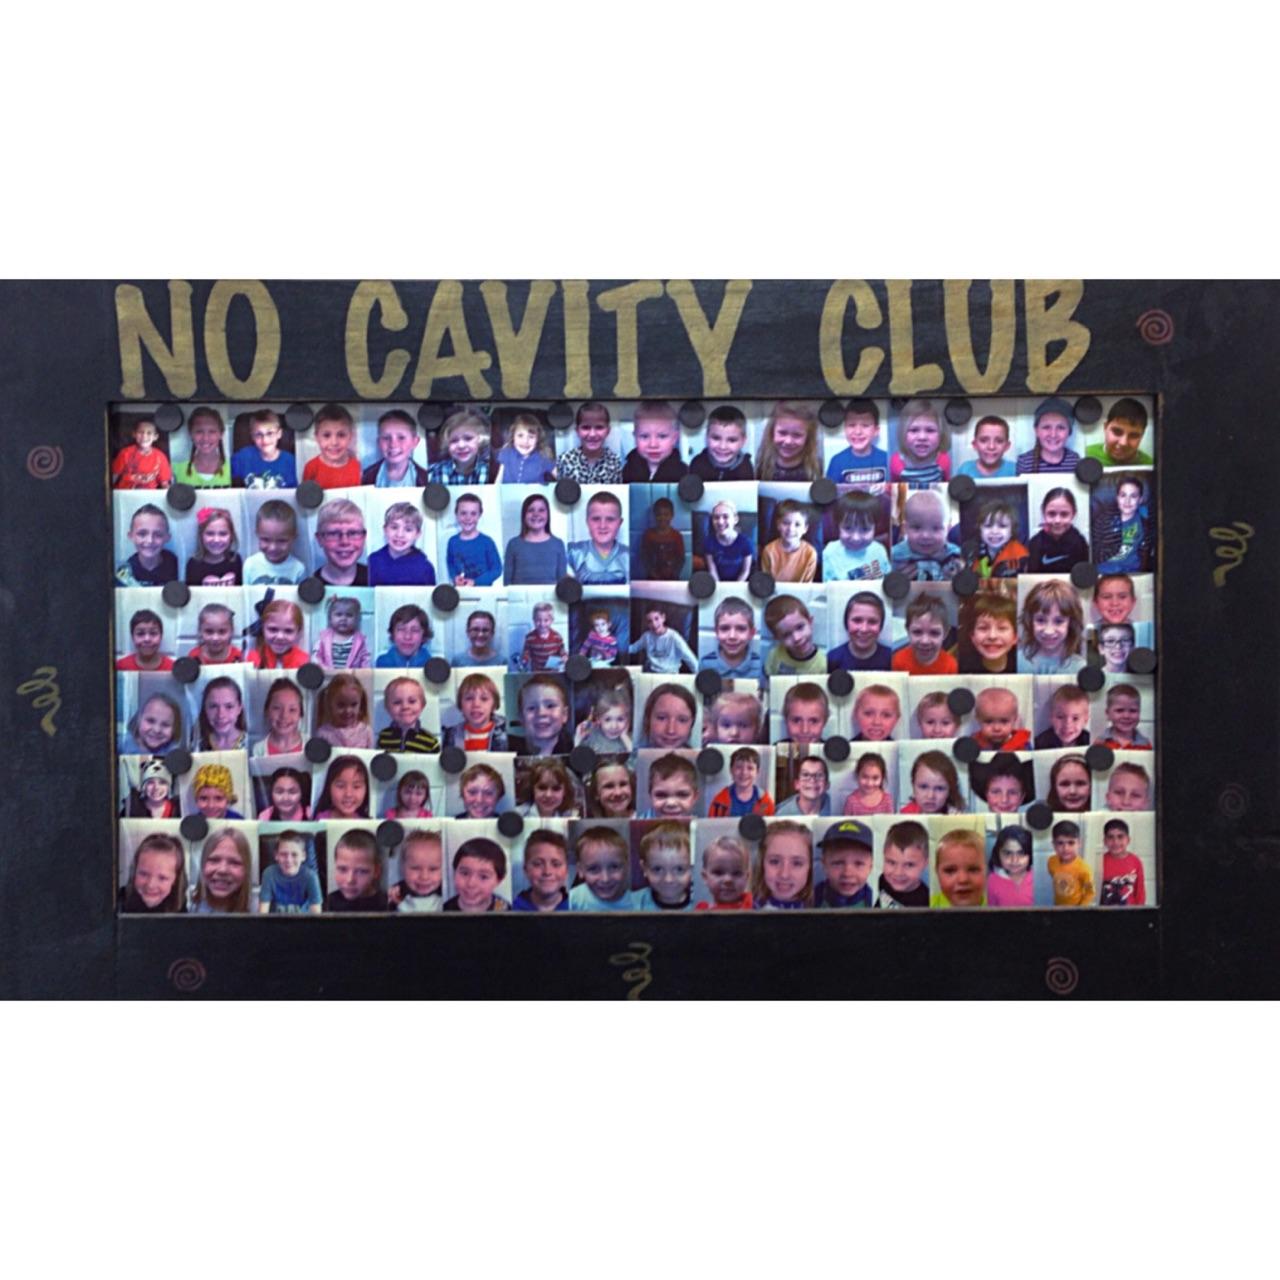 No Cavity Club board